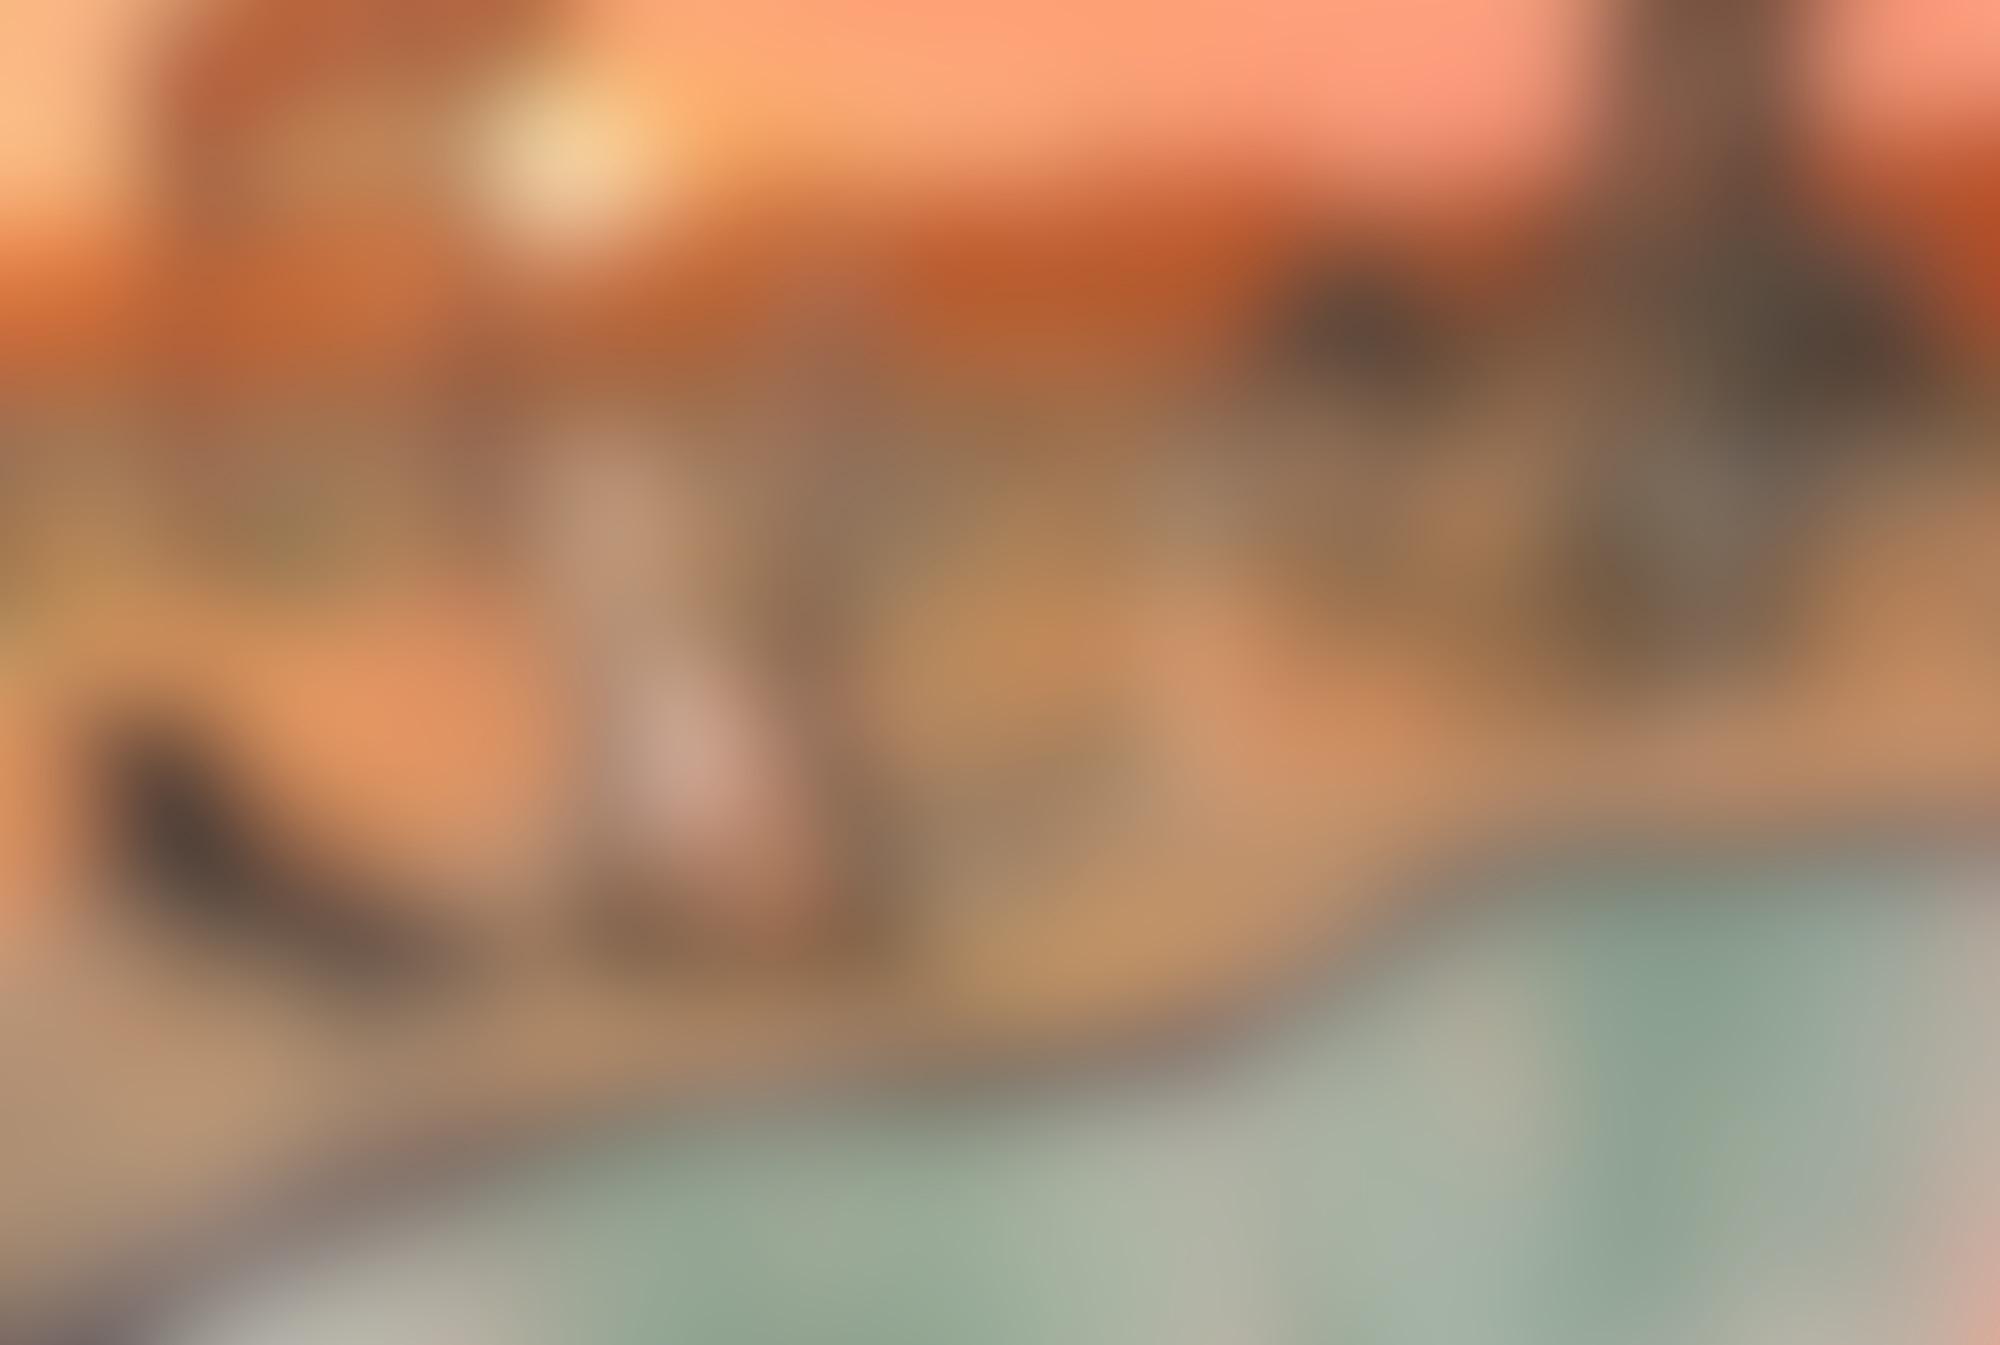 Alice tye illustration oil paints desert motel 2019 hello america lectureinprogress 01 autocompressfitresizeixlibphp 1 1 0max h2000max w3 D2000q80scef3823809d9113fad4e367b18c9145a